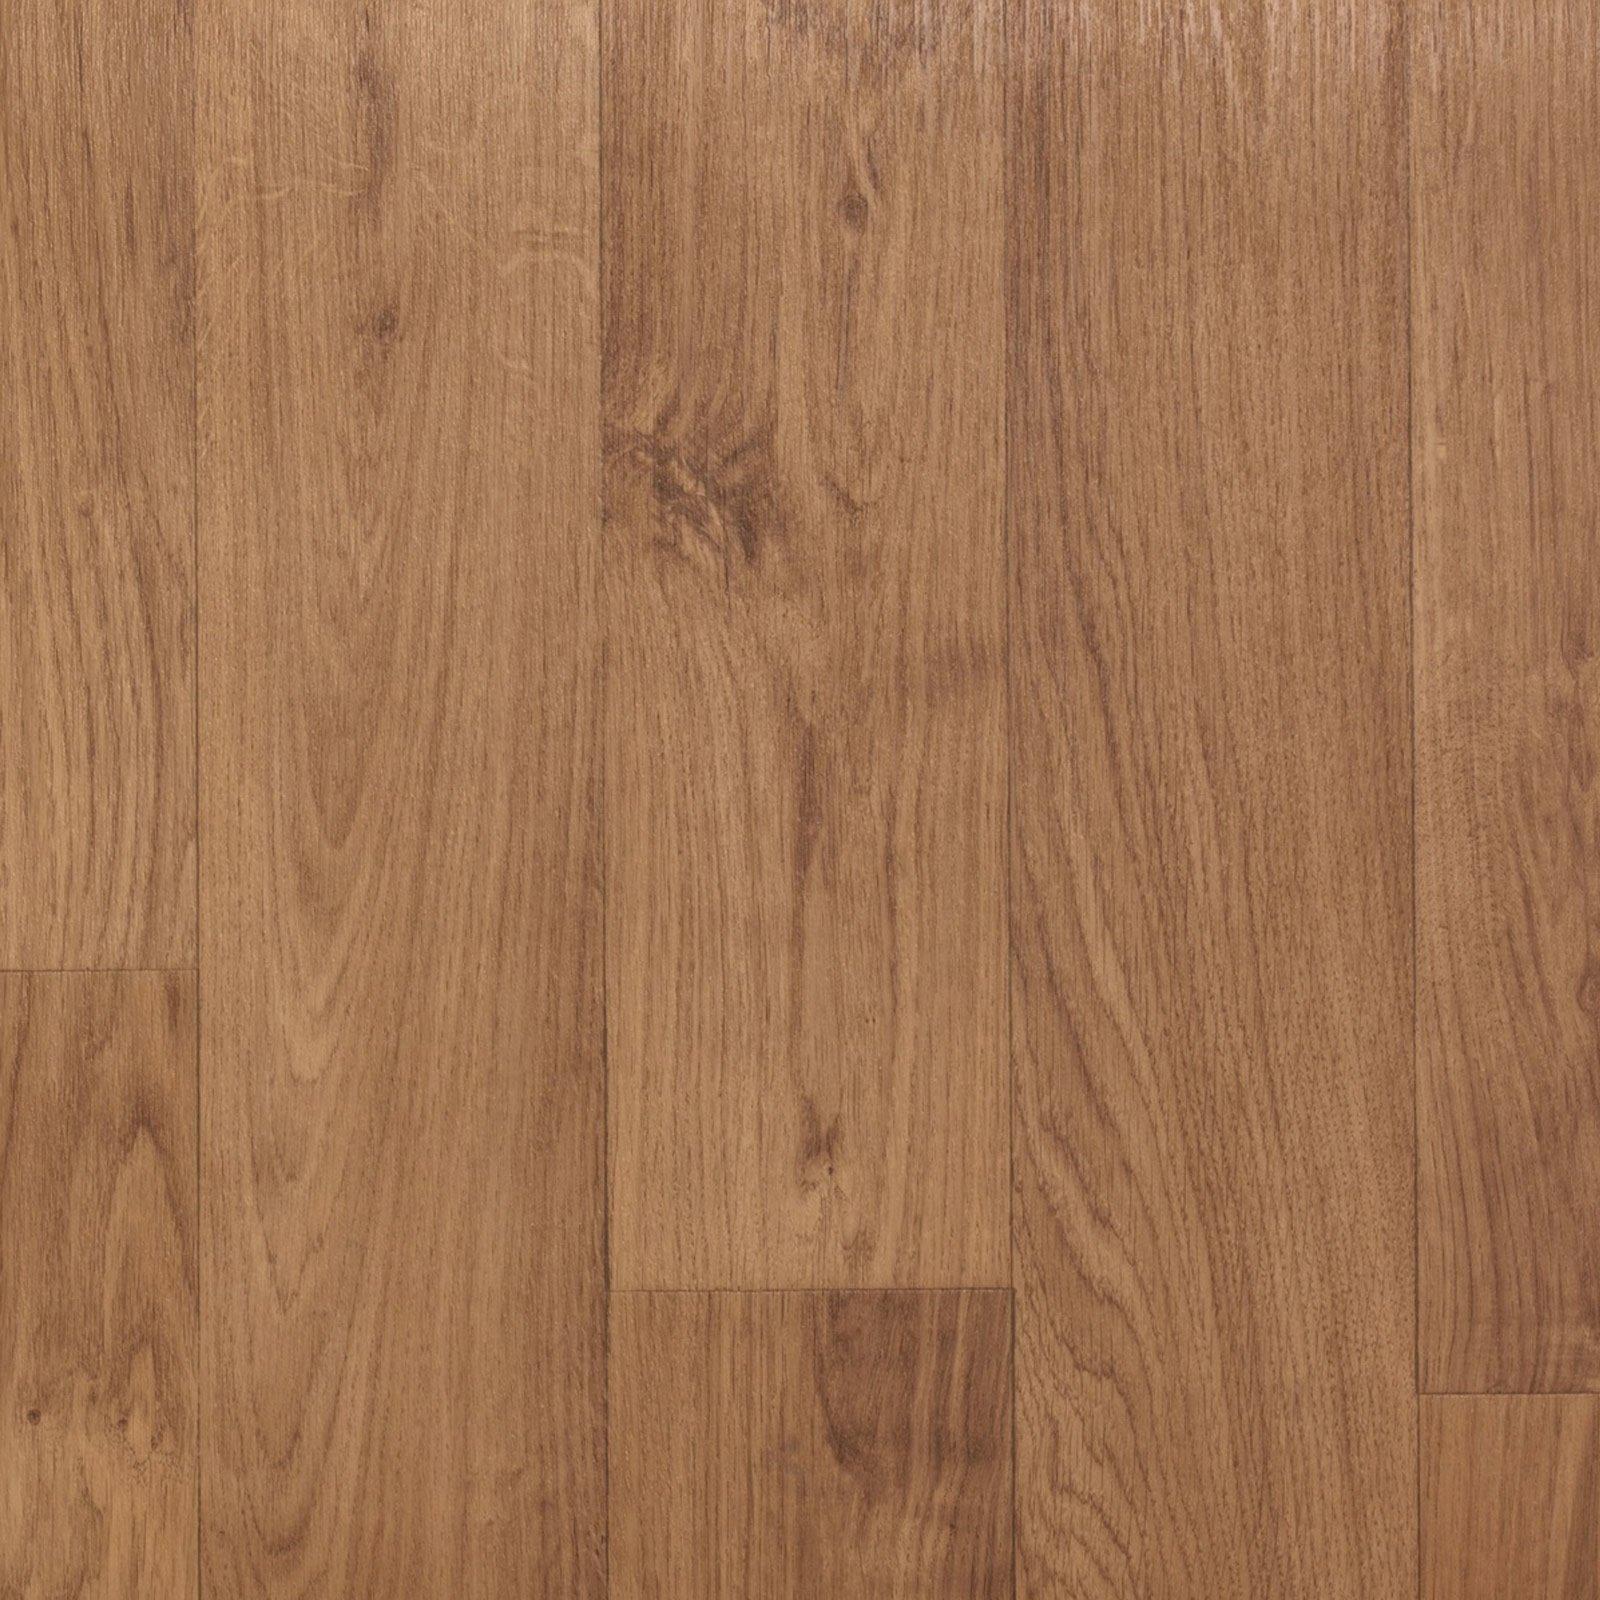 pvc bodenbelag essentials planke braun 2 meter breit pvc boden bodenbel ge baumarkt. Black Bedroom Furniture Sets. Home Design Ideas